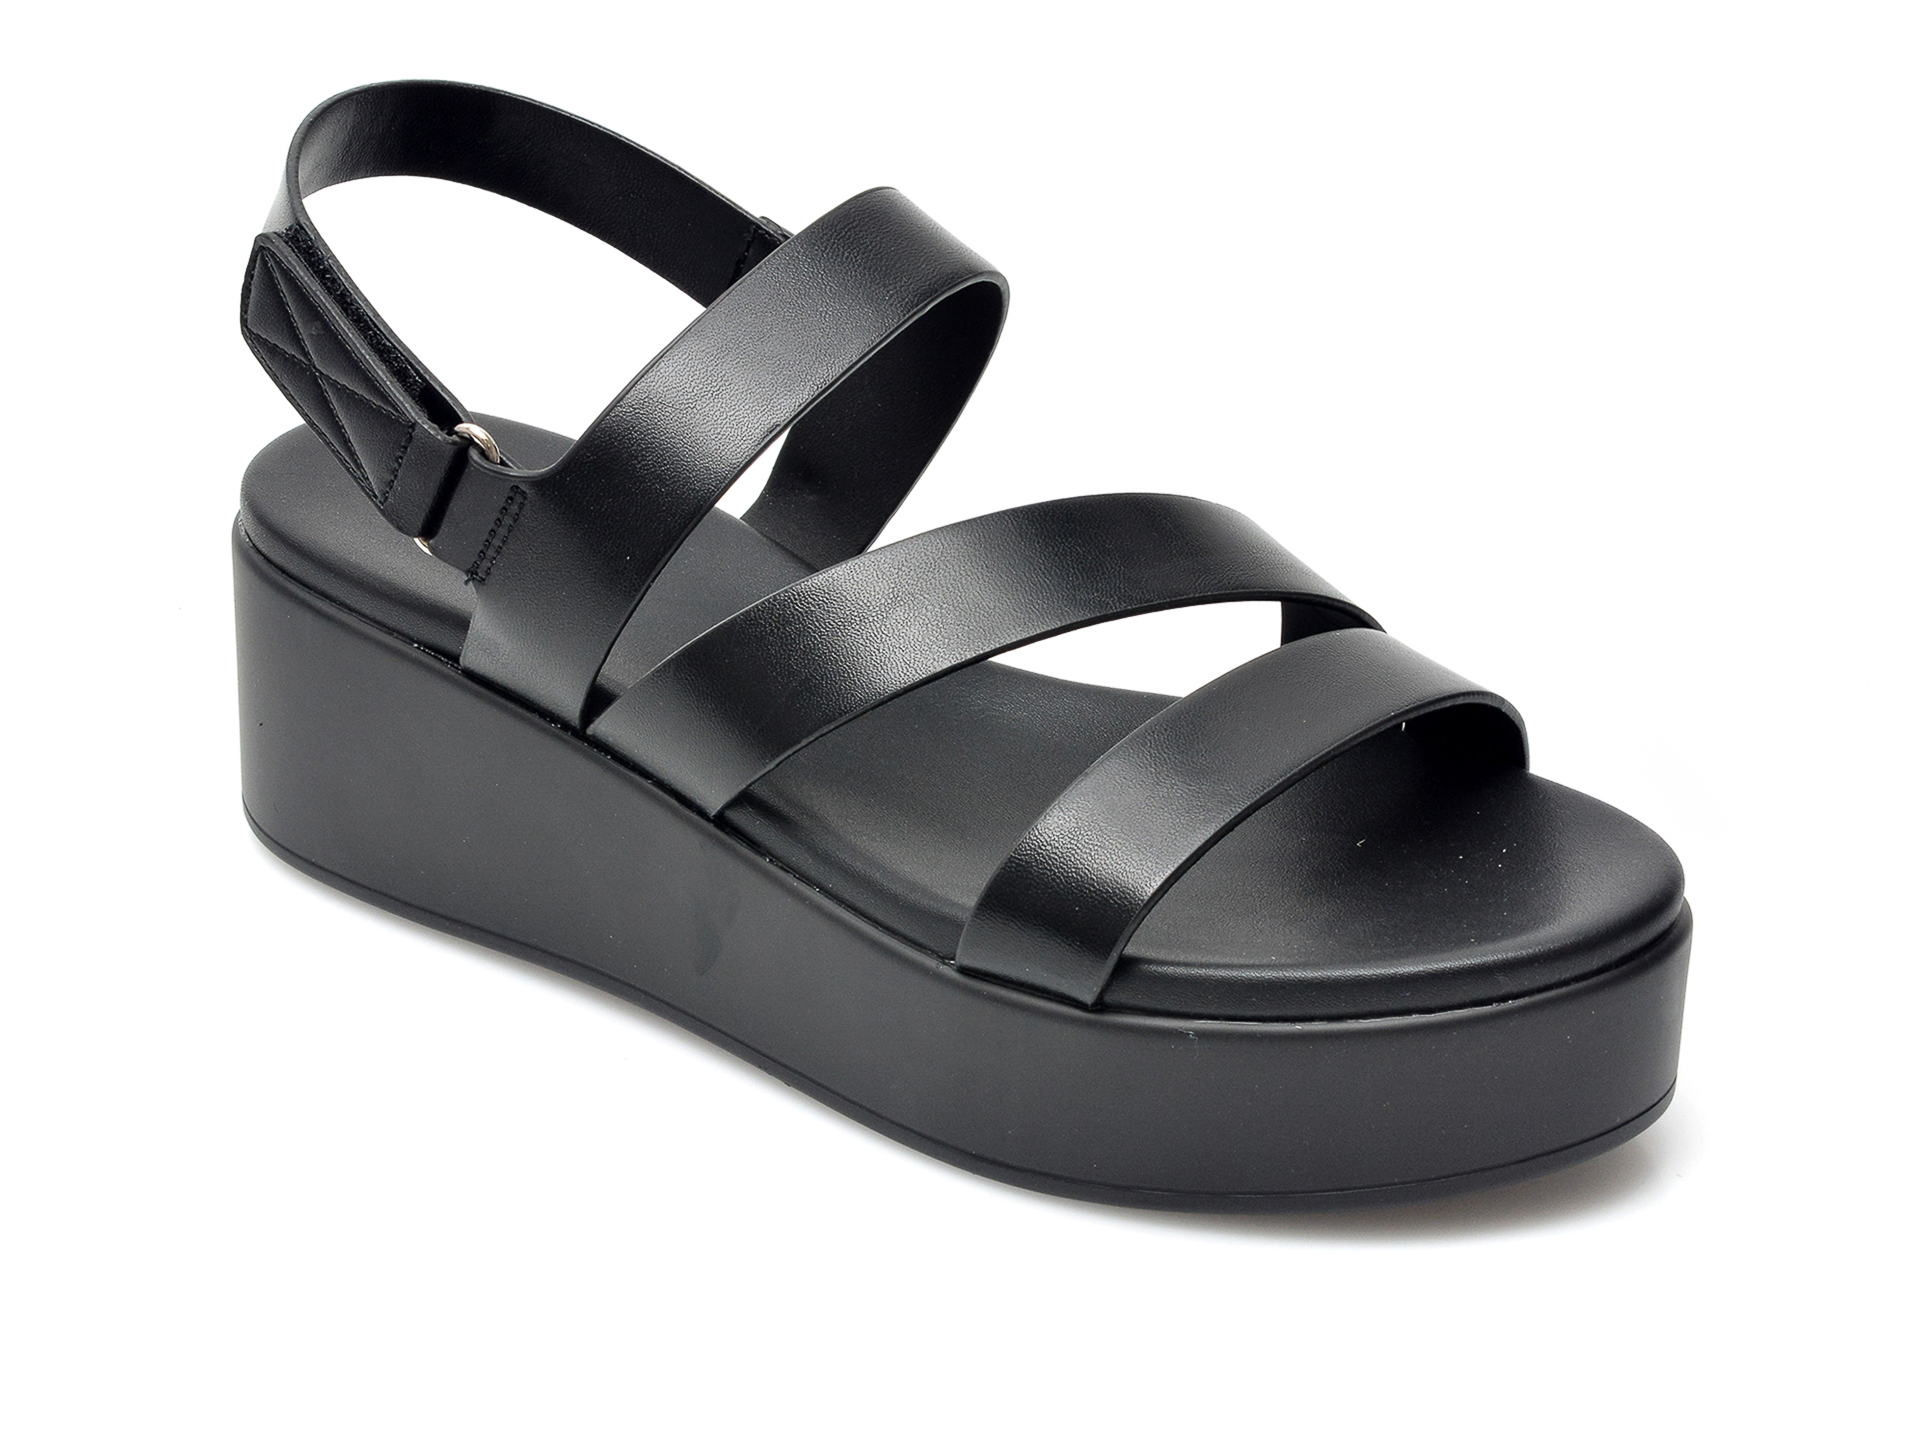 Sandale ALDO negre, Perwell001, din piele ecologica imagine otter.ro